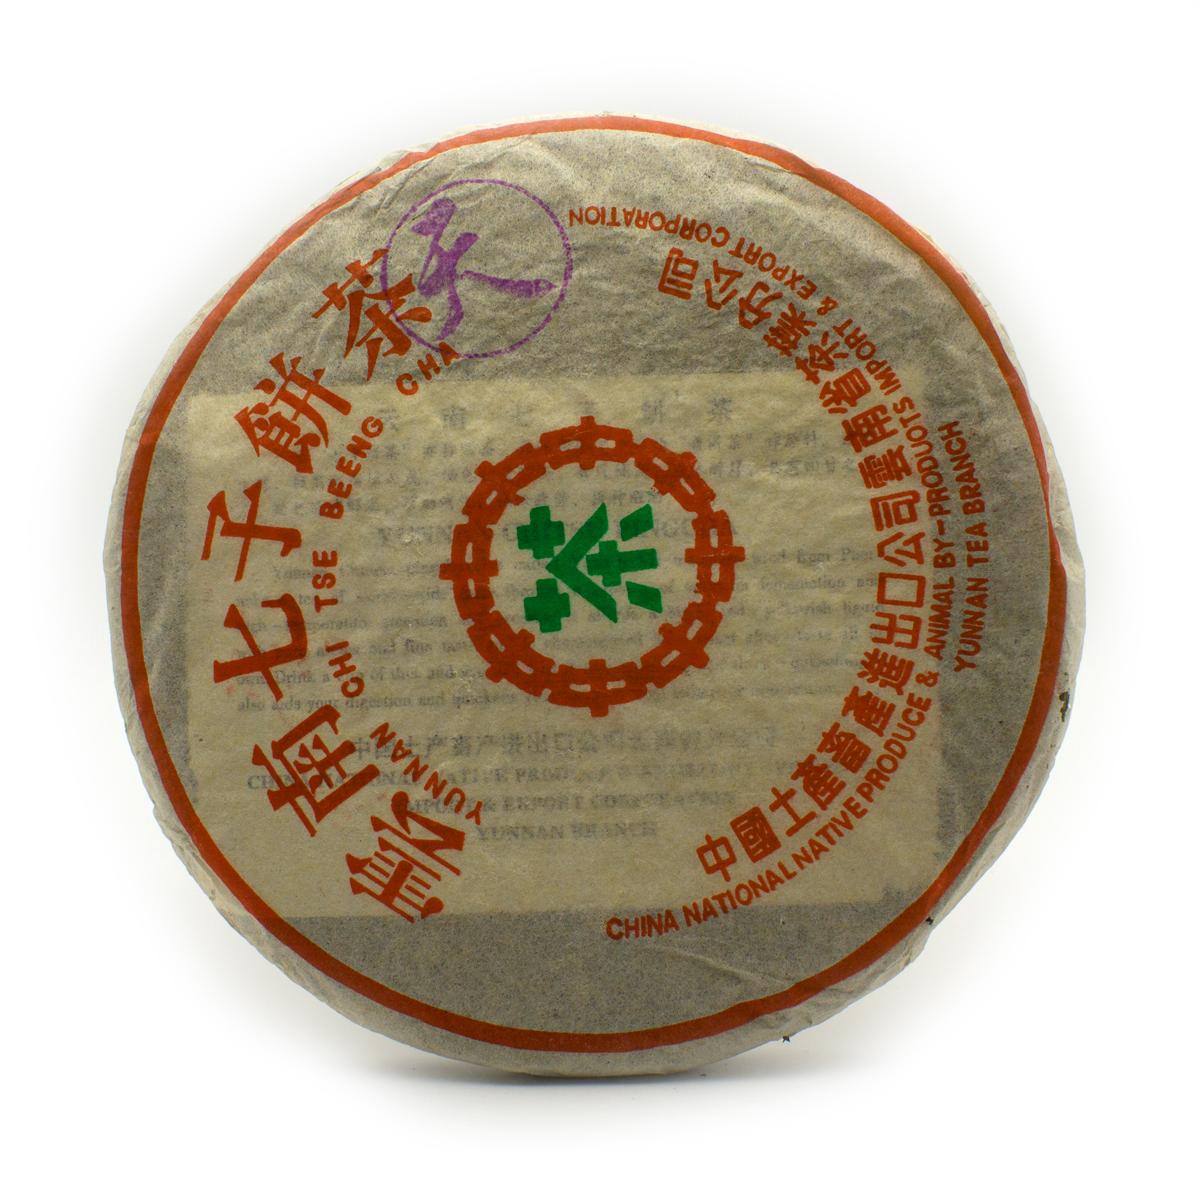 Юннань Чи Цзе Бинг Шен Пуэр (блин), 357 г, 1998